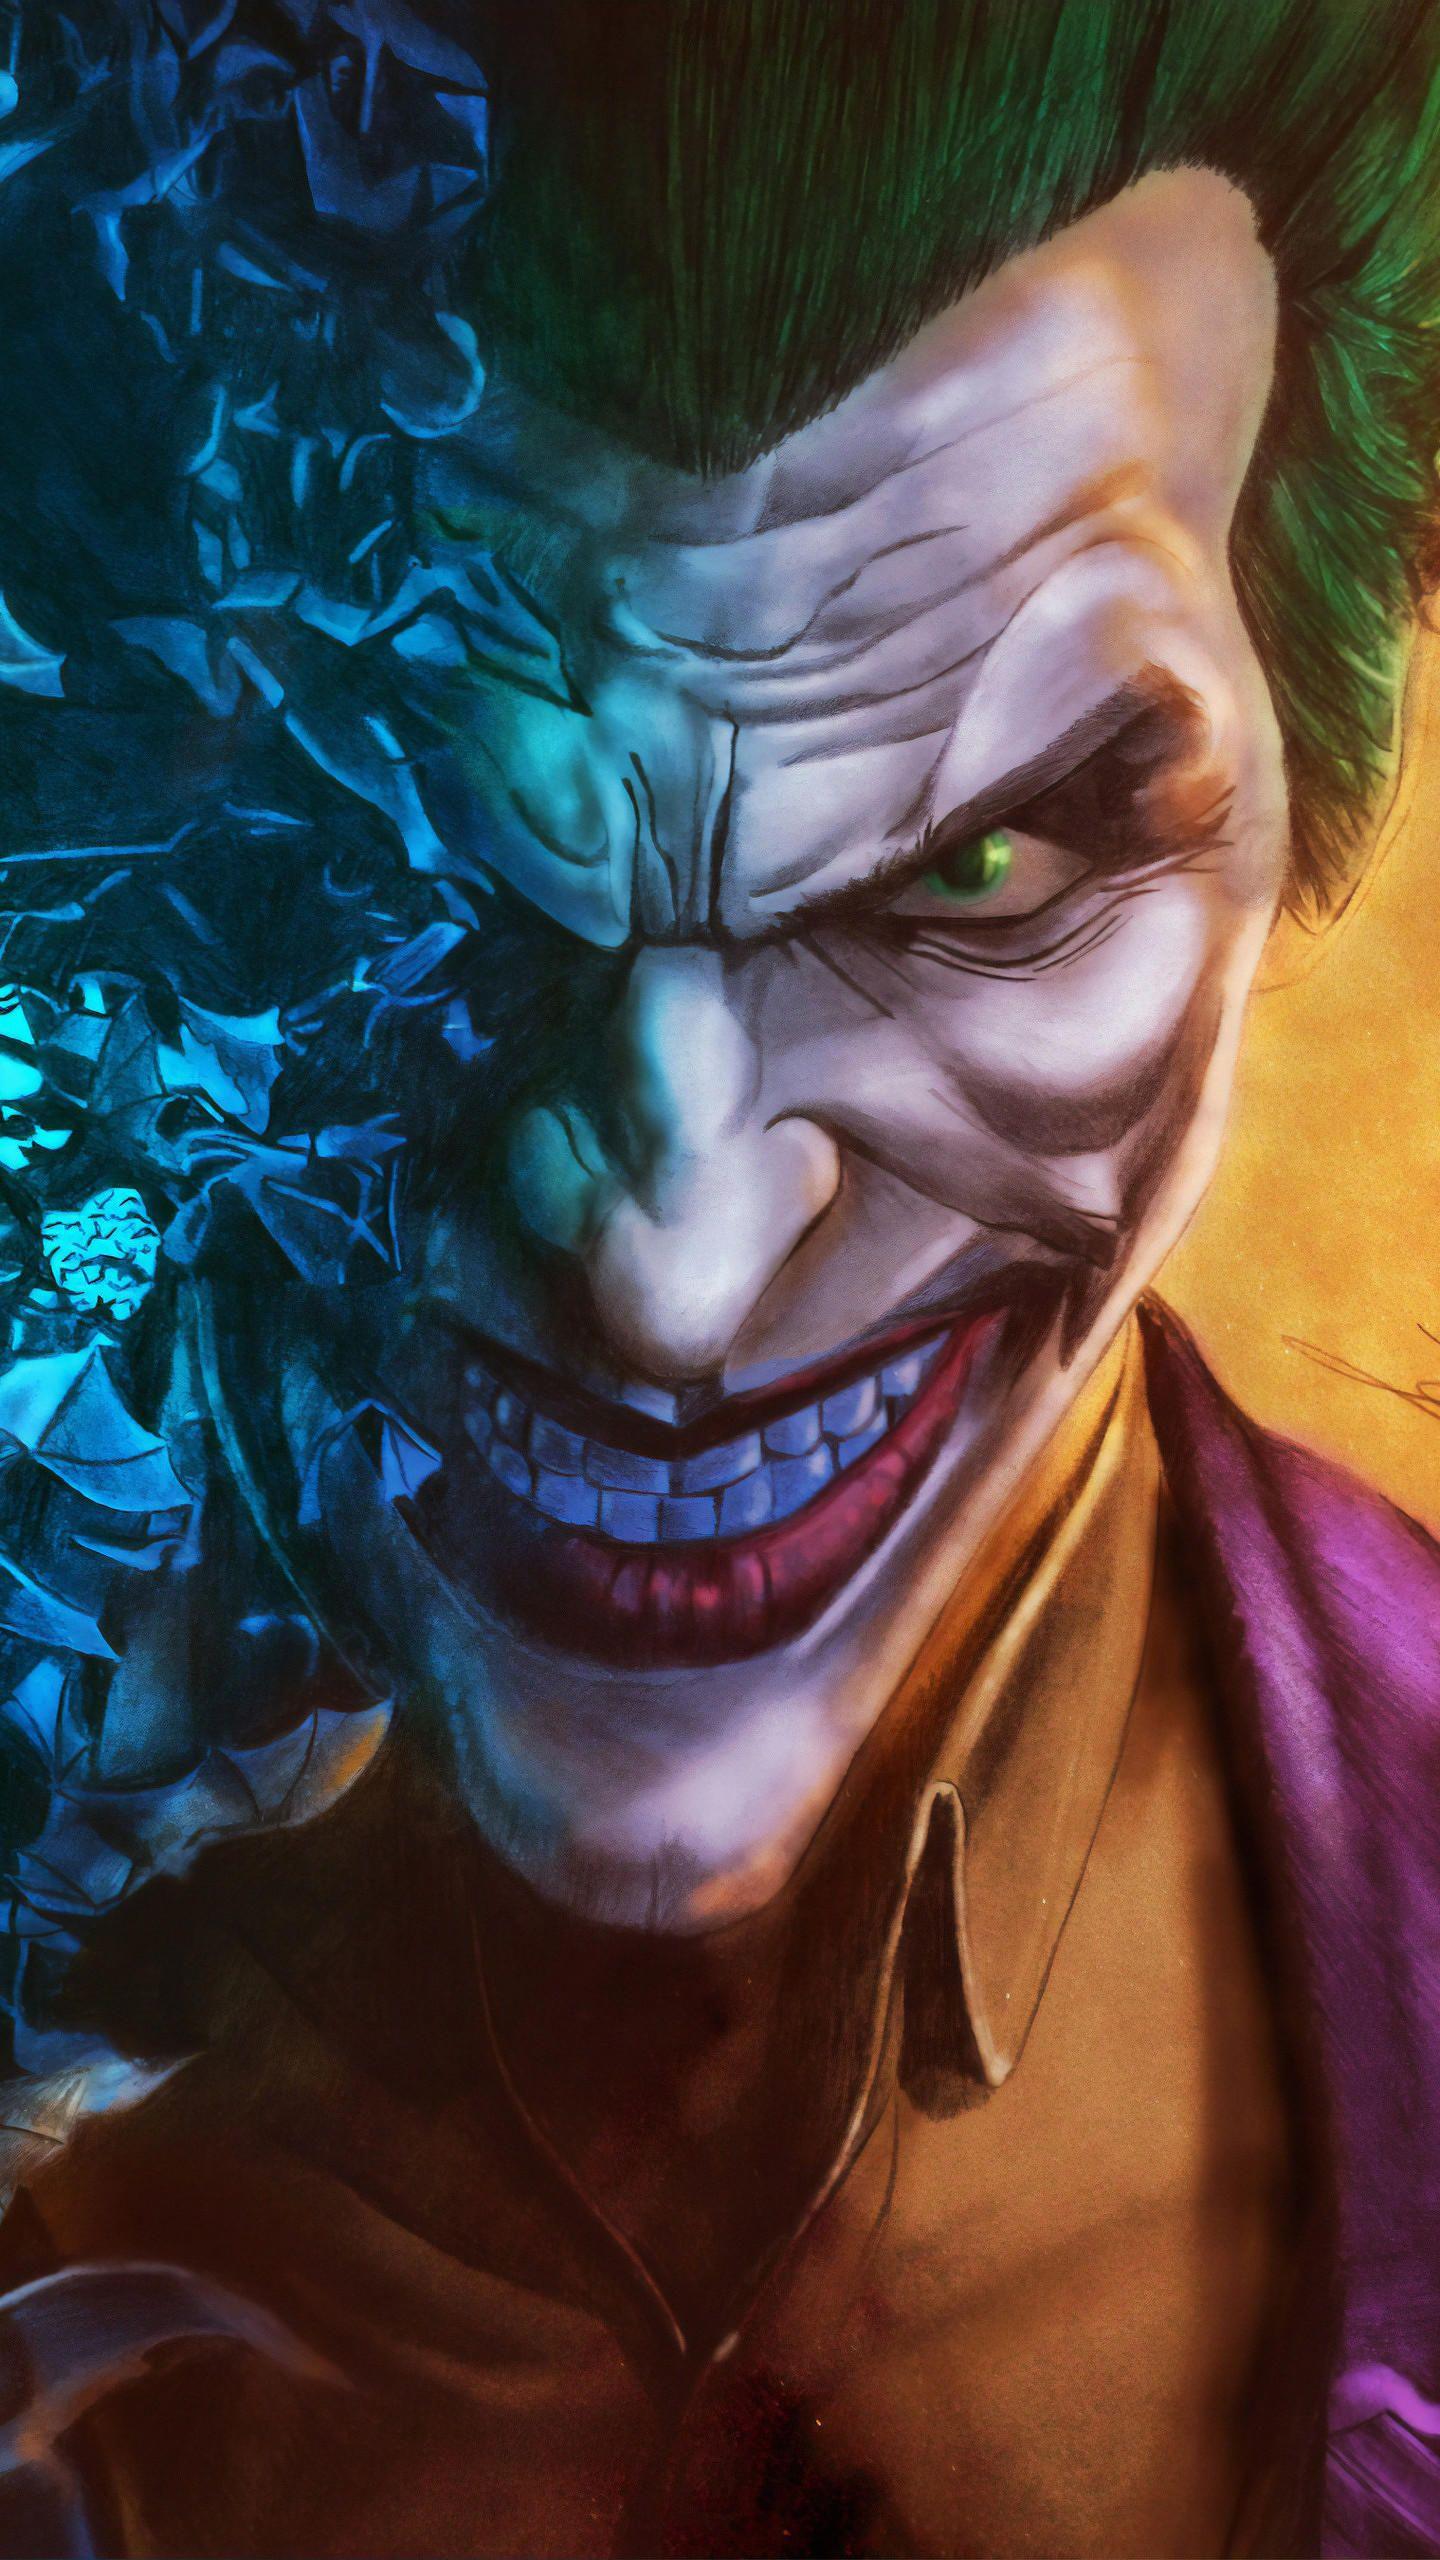 Download 1440x2560 Resolution Of Joker Hd 4k Superheroes Supervillain Digital Art Artwork Dev Joker Wallpapers Joker Hd Wallpaper Joker Drawings Batman joker joker wallpaper 4k for